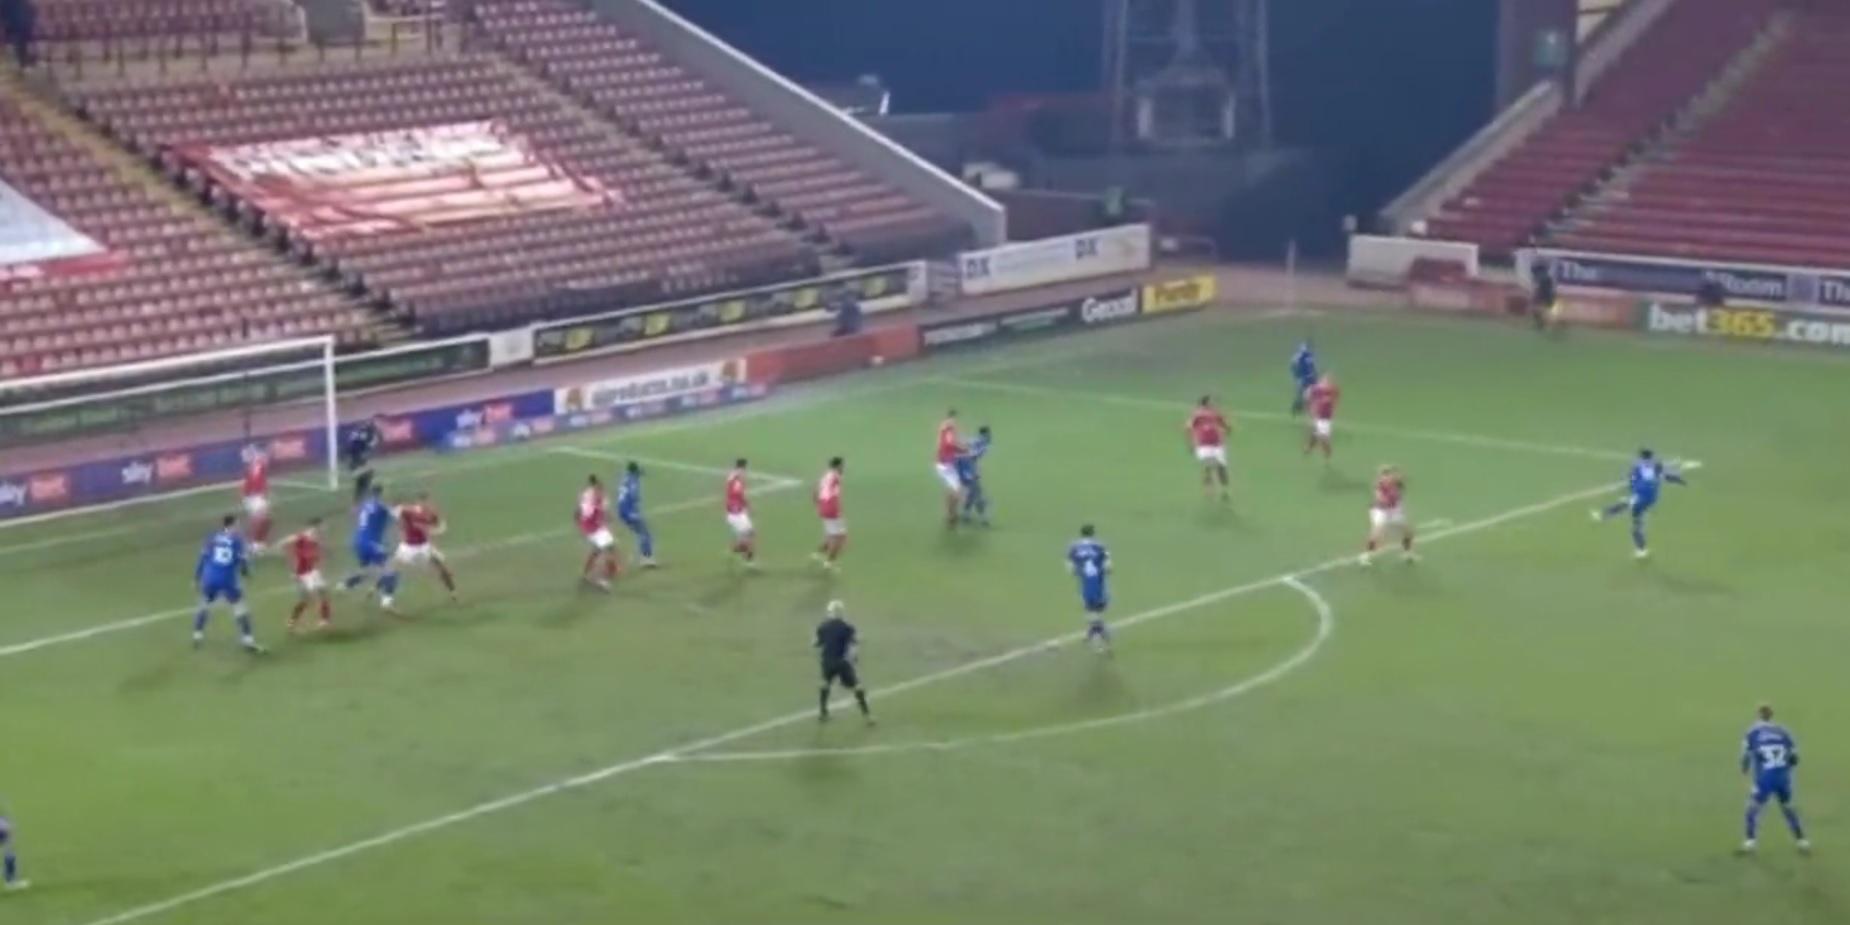 (Video) Liverpool loanee Sheyi Ojo dedicates goal to Sol Bamba